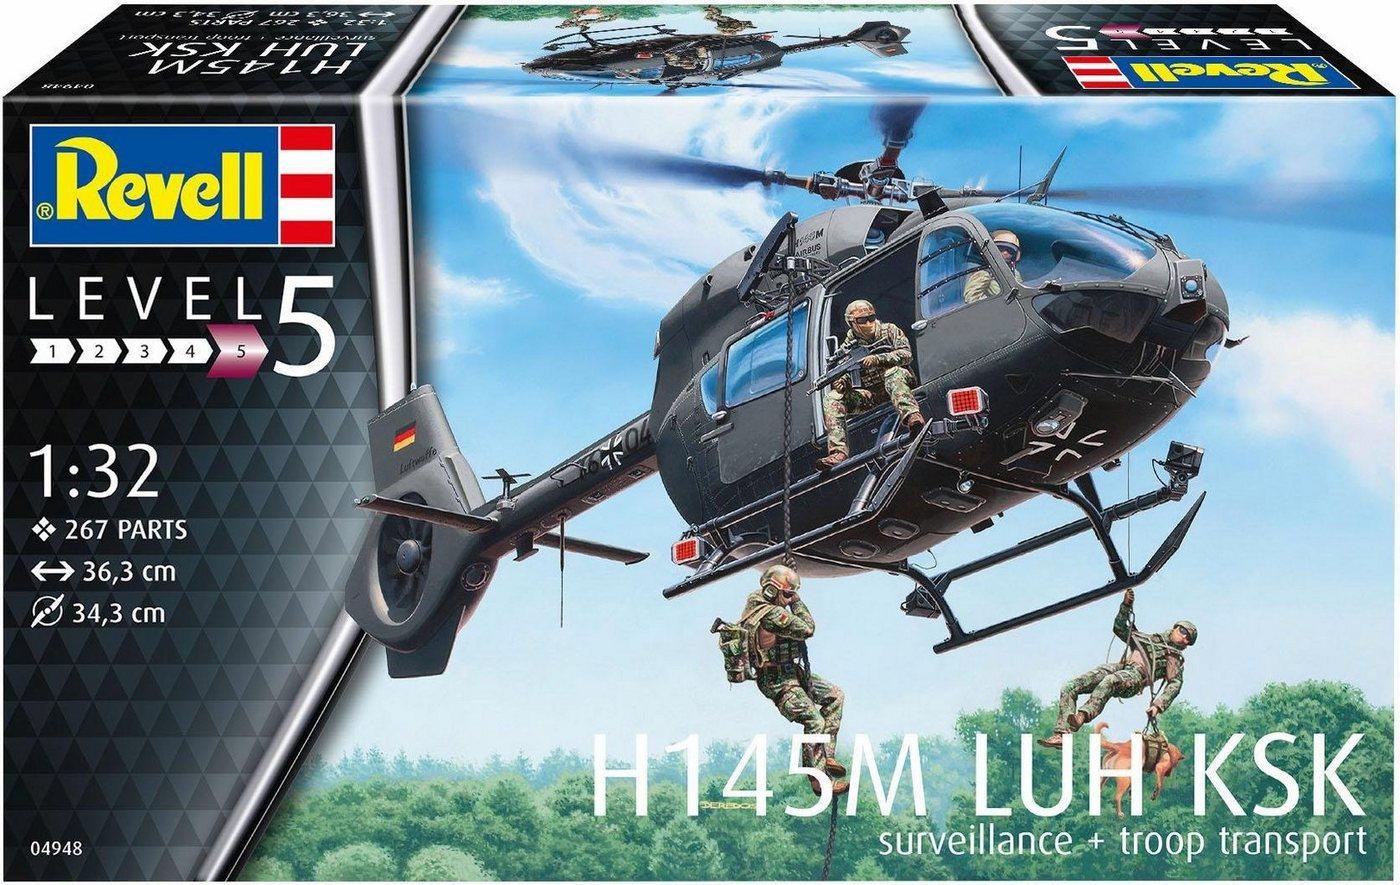 Revell Modellbausatz Hubschrauber, »H145M LUH KSK«